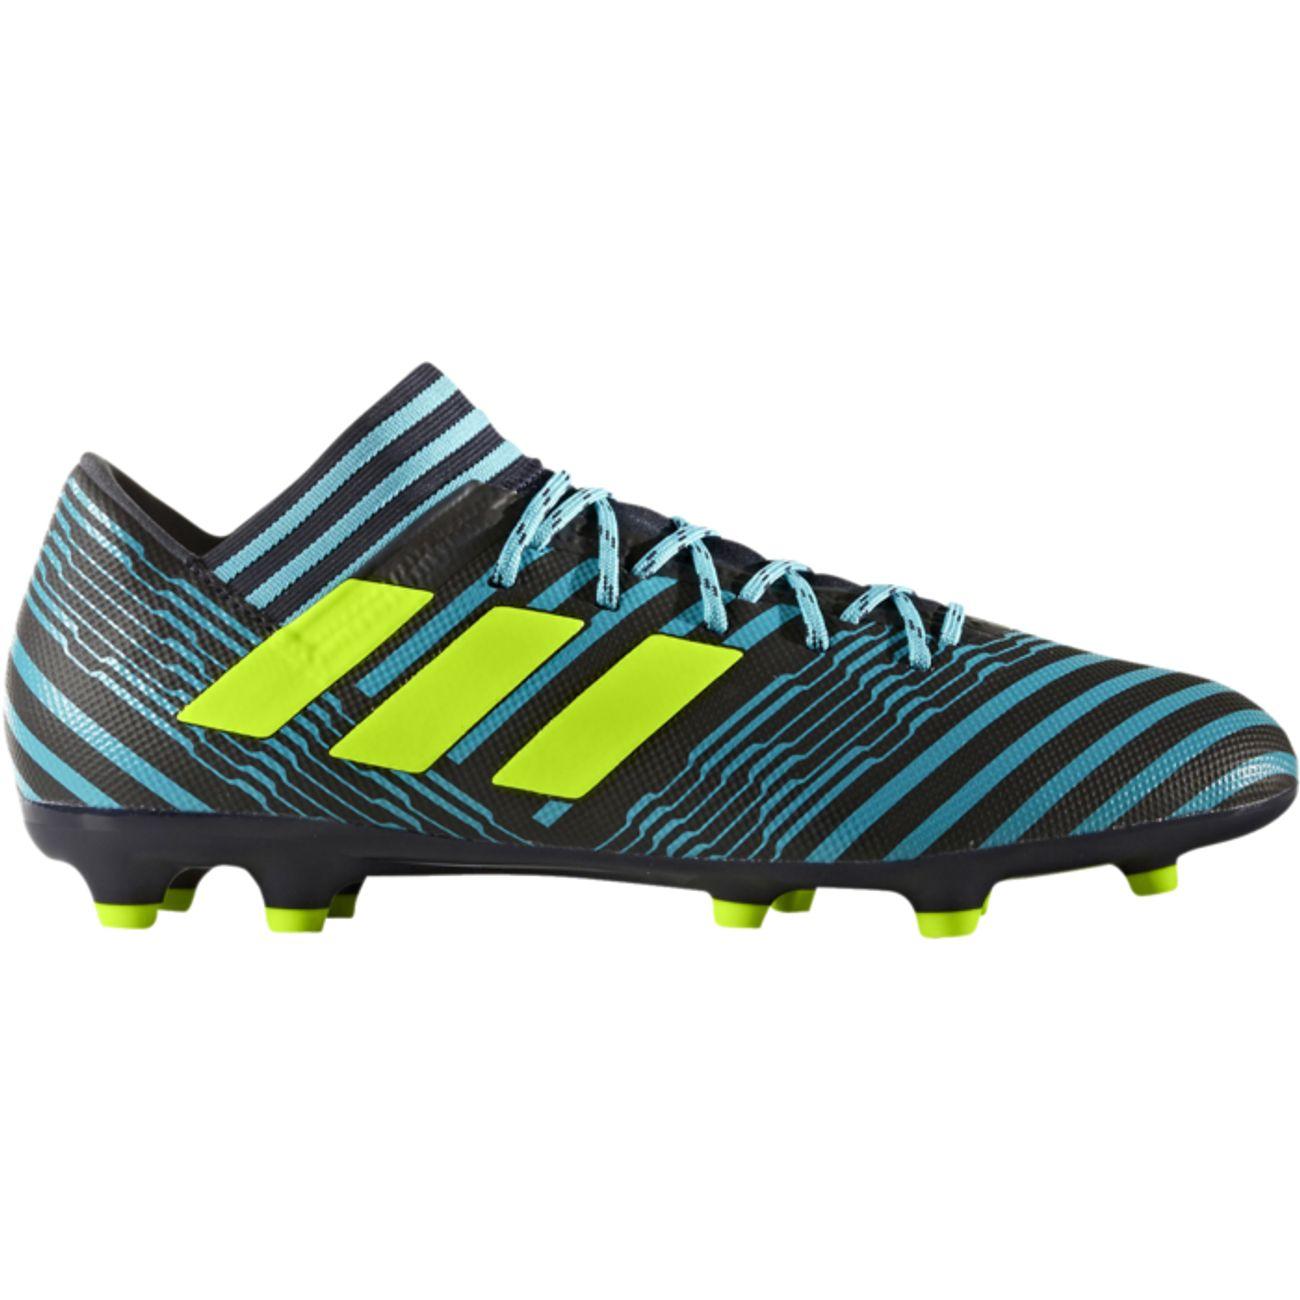 Fg Adidas Adulte Chaussures Nemeziz 17 3 UMLzVSpGq